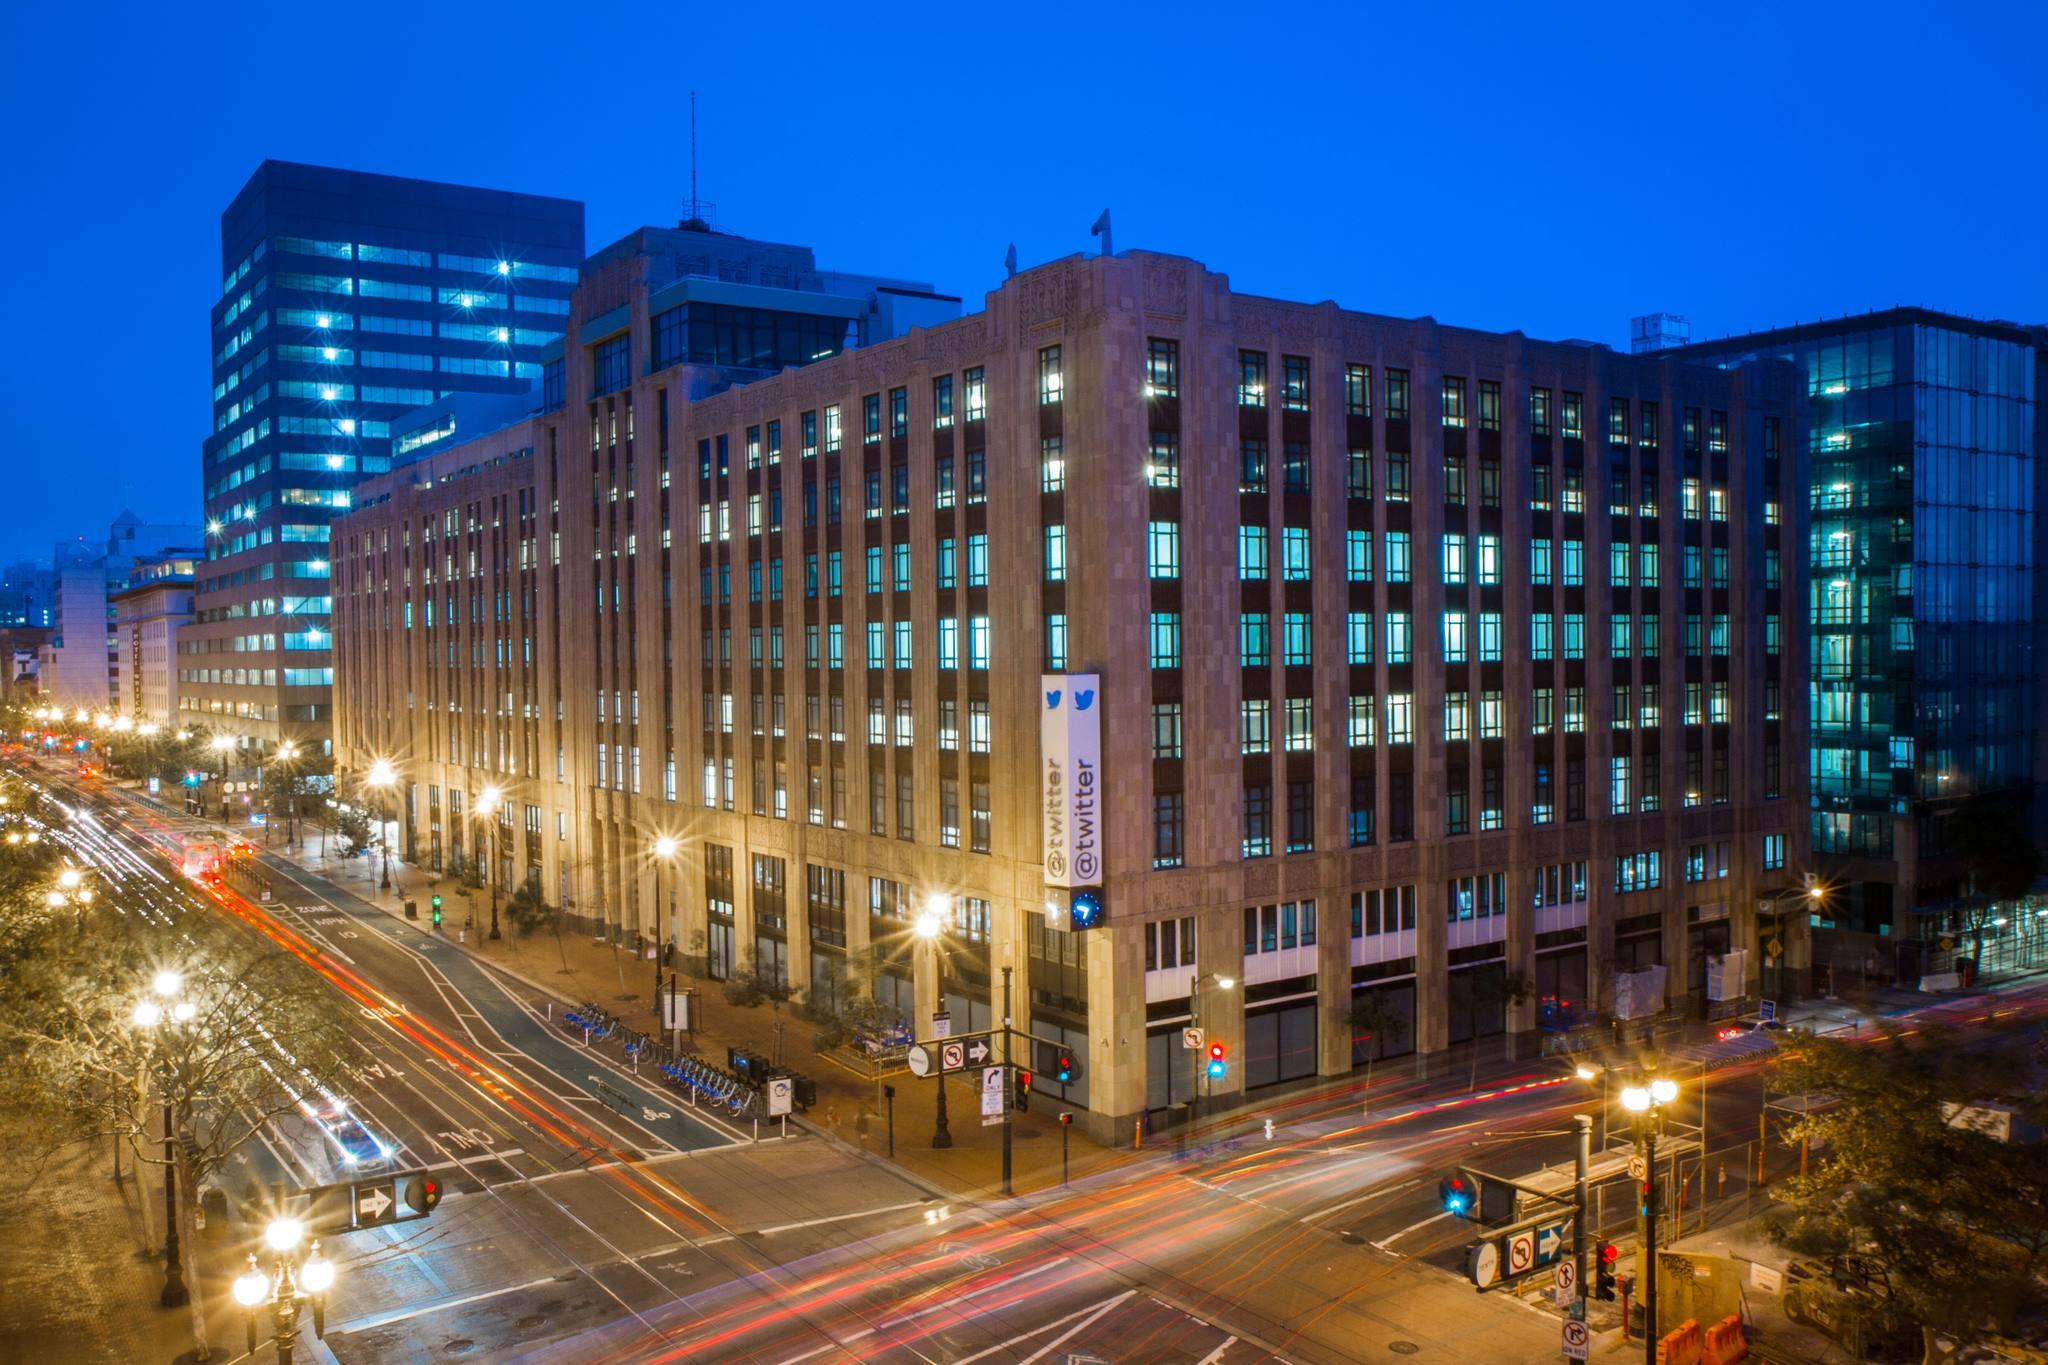 Twitter's headquarters in San Francisco